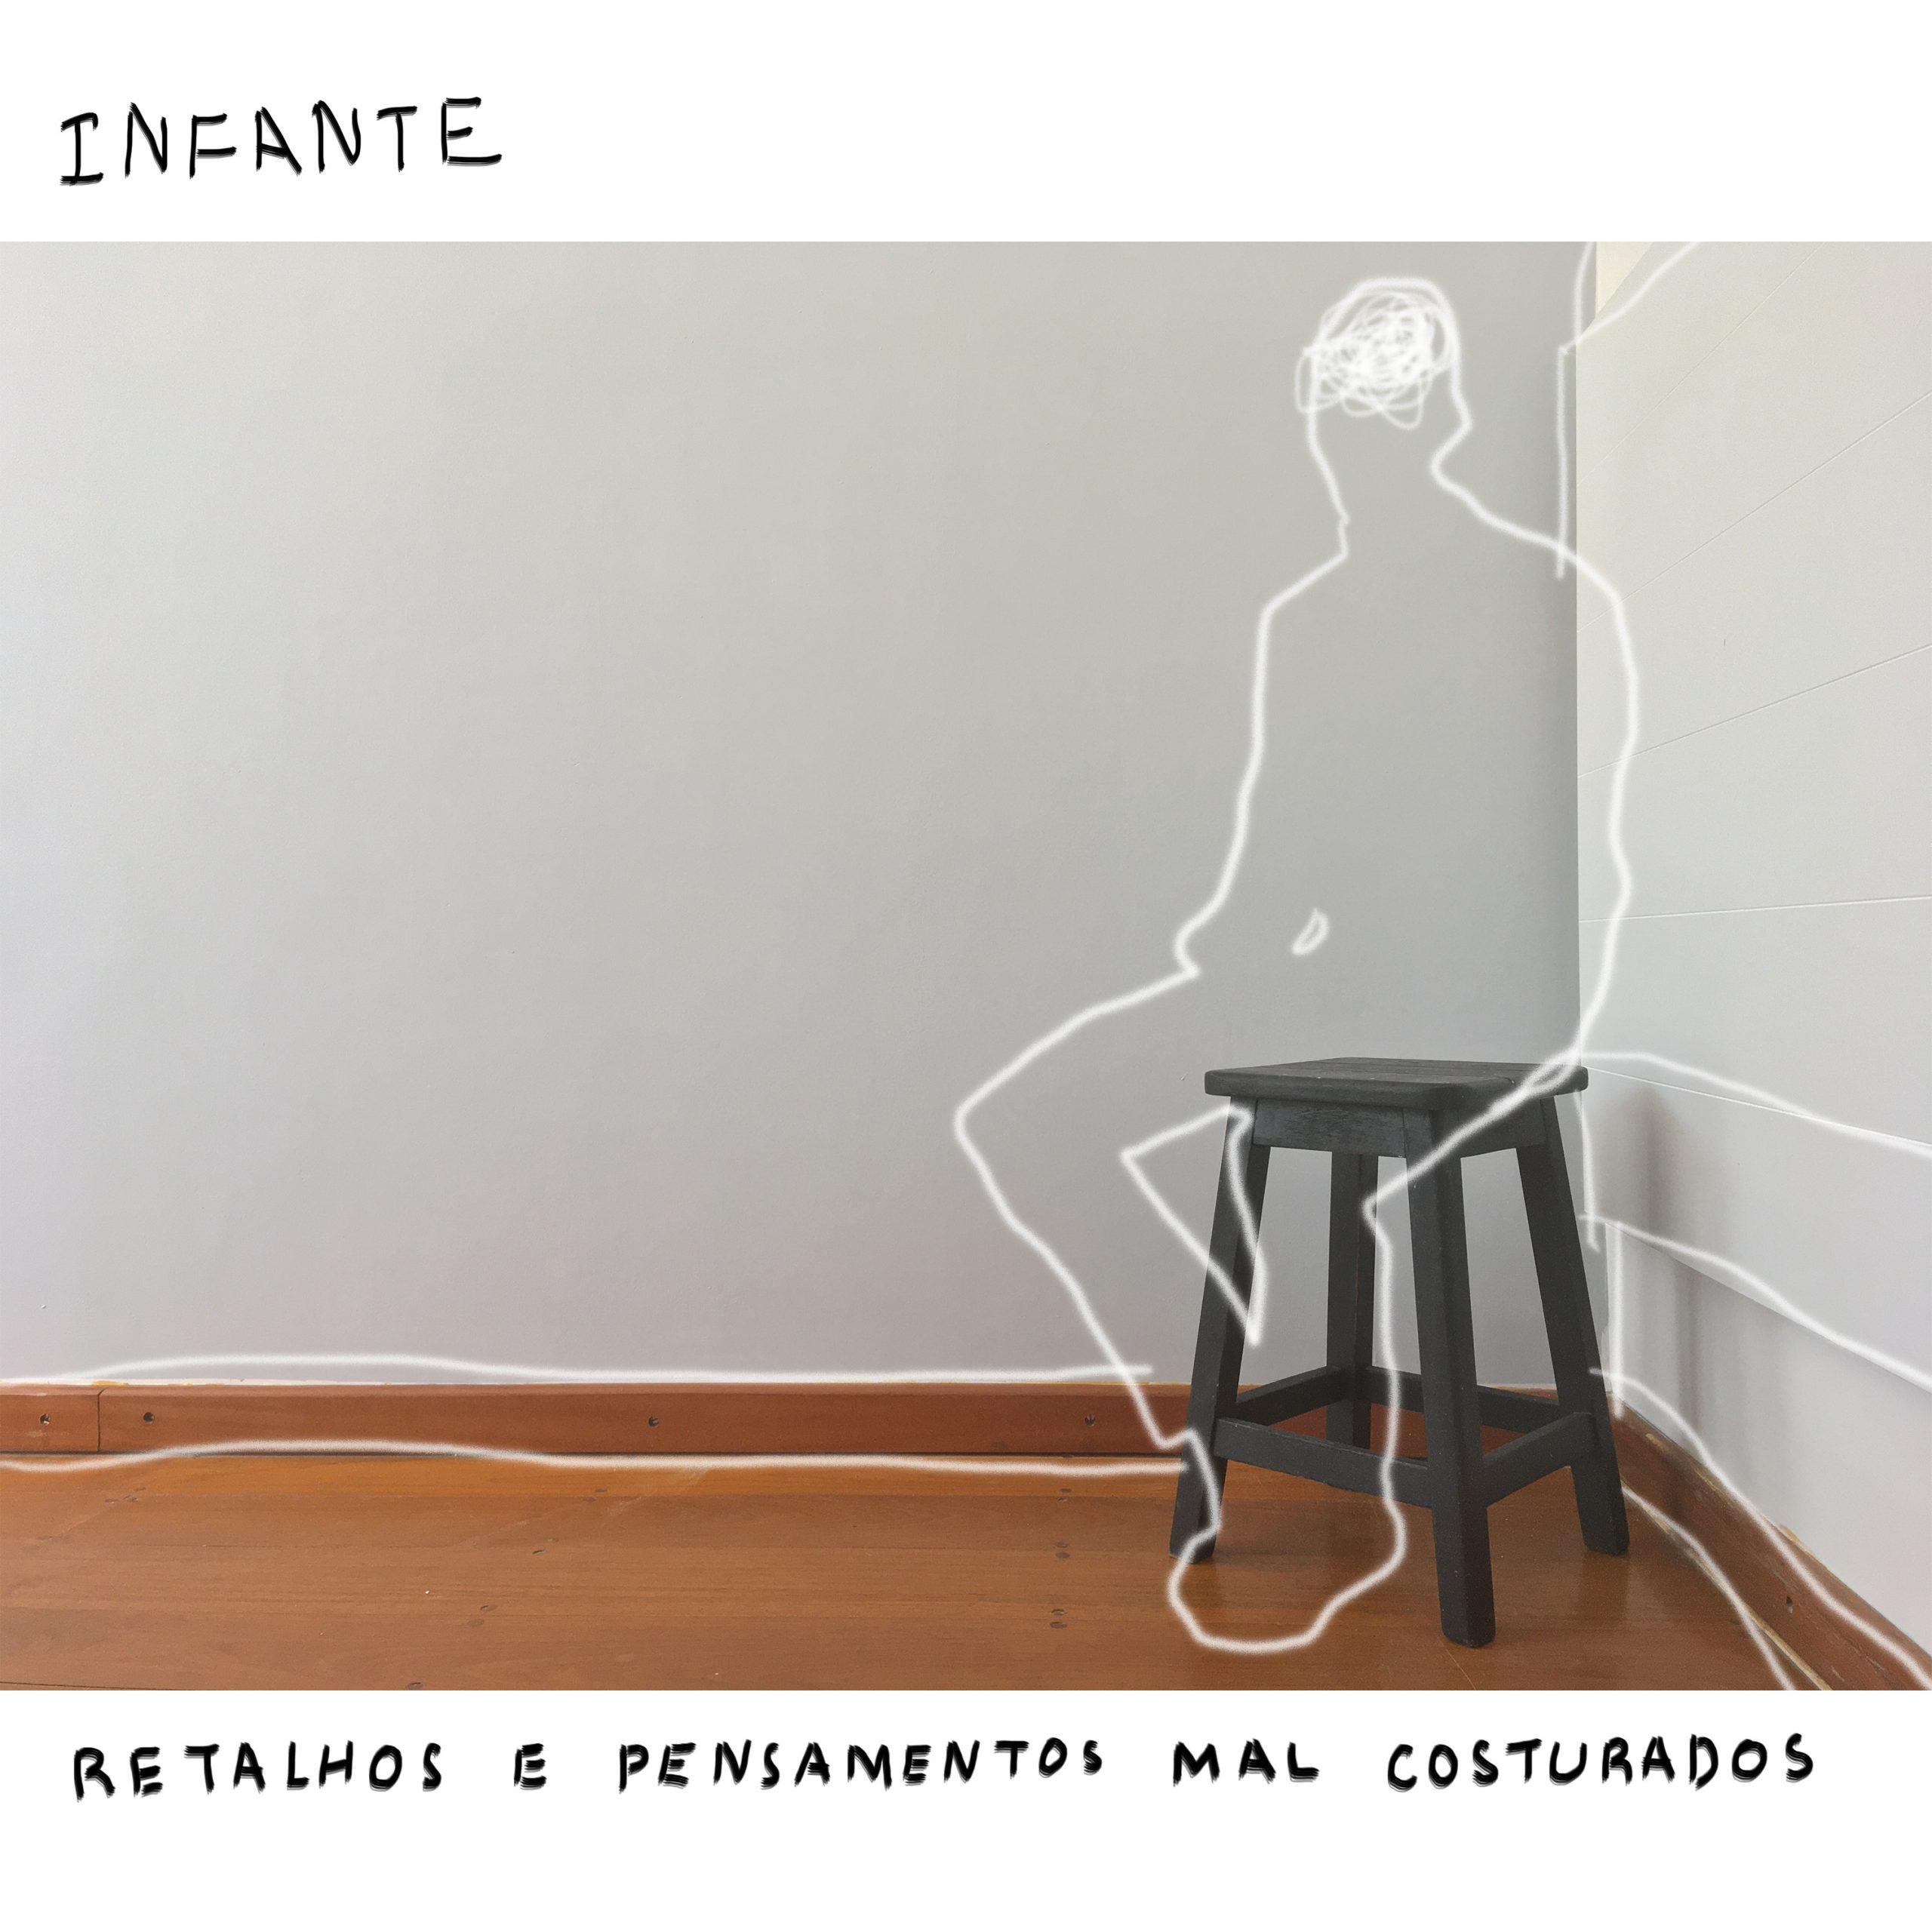 Capa do EP por Fernando Lodi